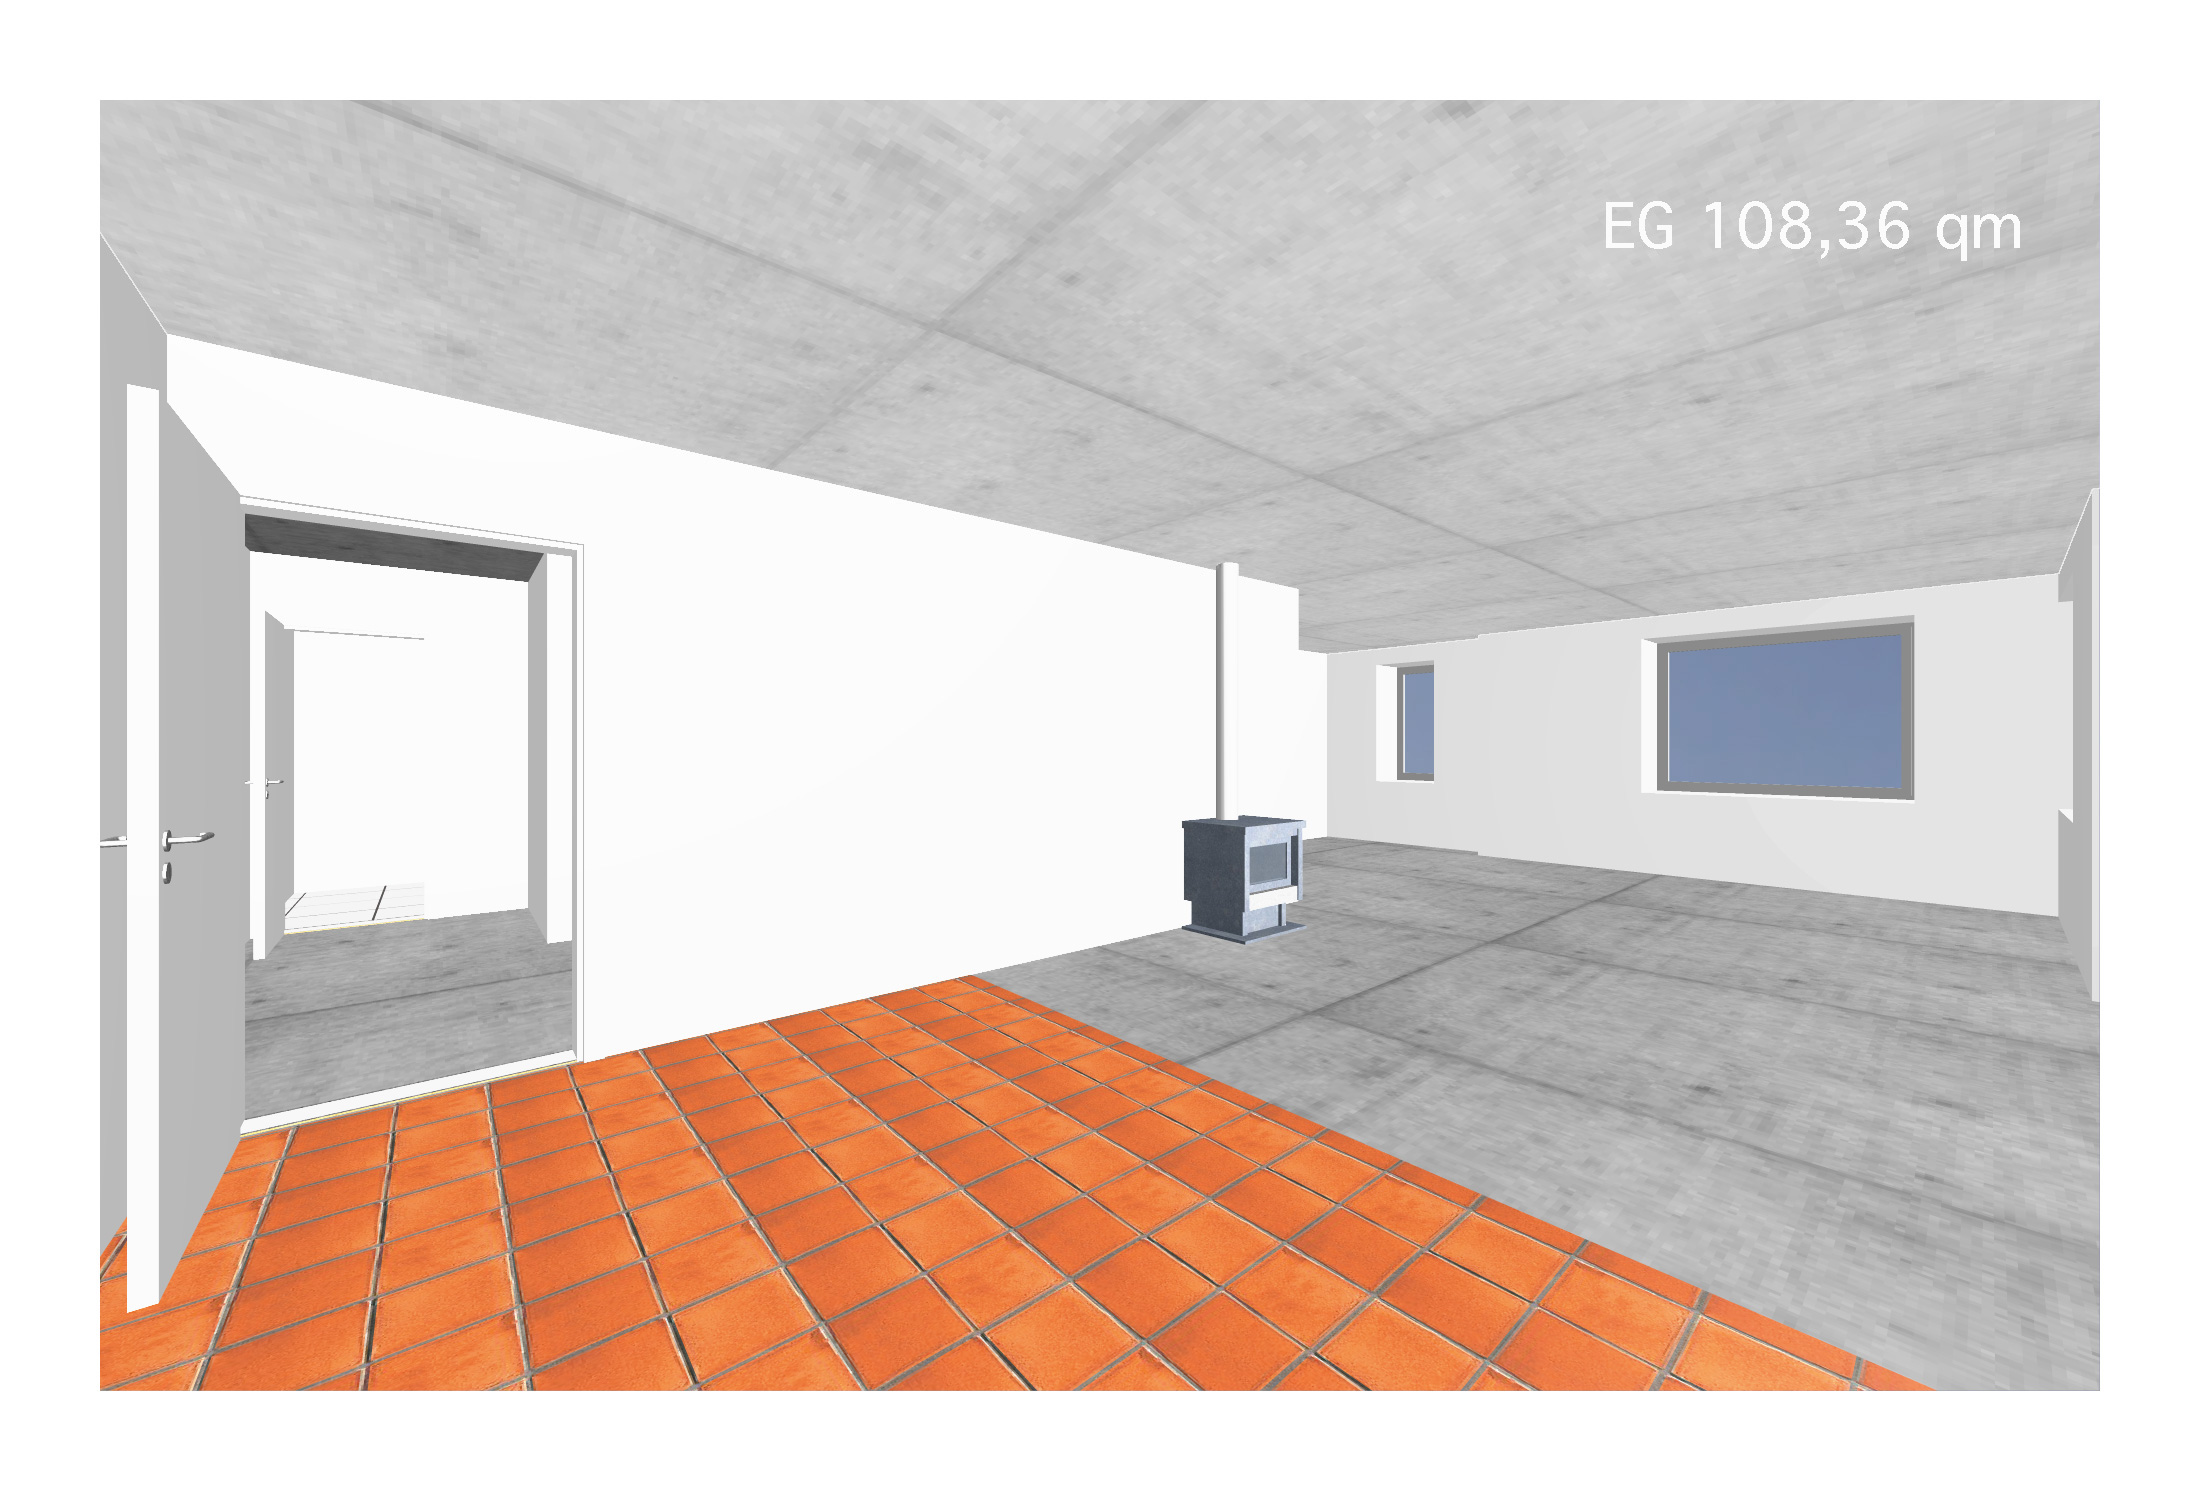 kche aus porenbeton kche selber bauen ytong jtleigh ideen intended with regard to cool. Black Bedroom Furniture Sets. Home Design Ideas